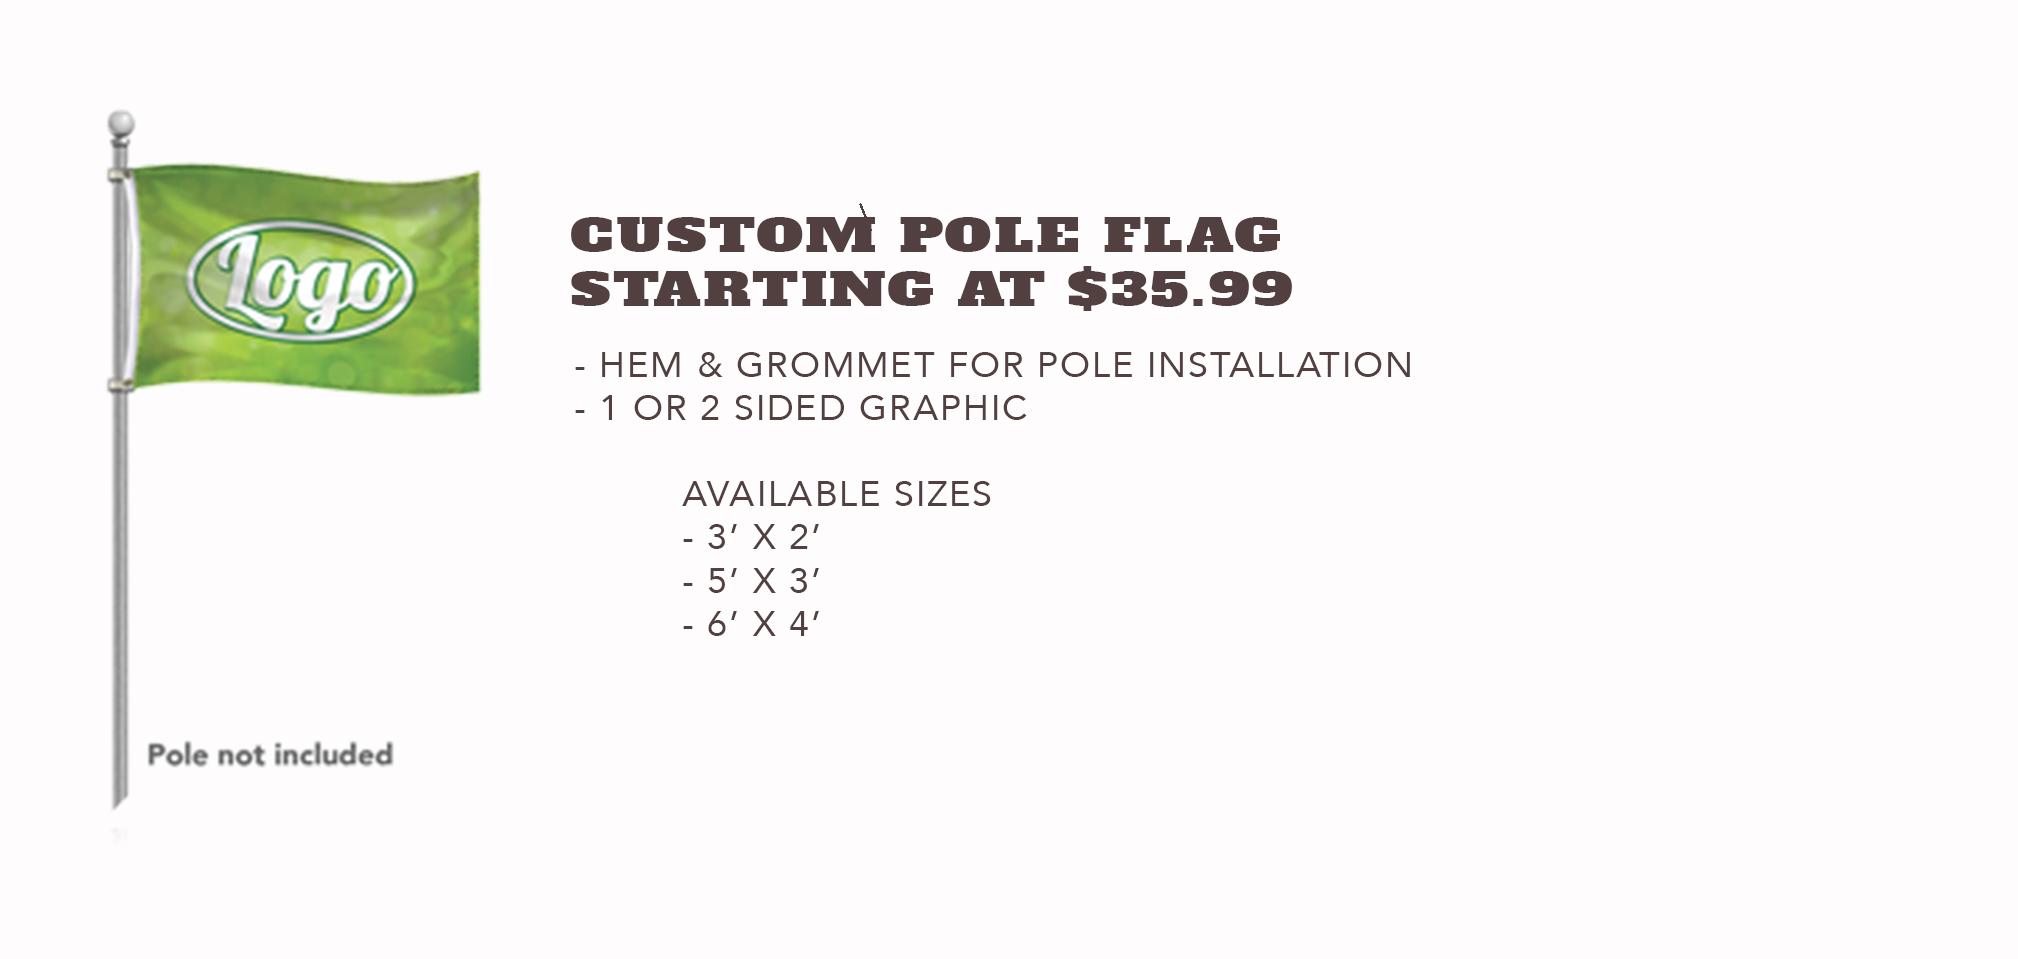 Custom Pole Flag - Starting at $35.99